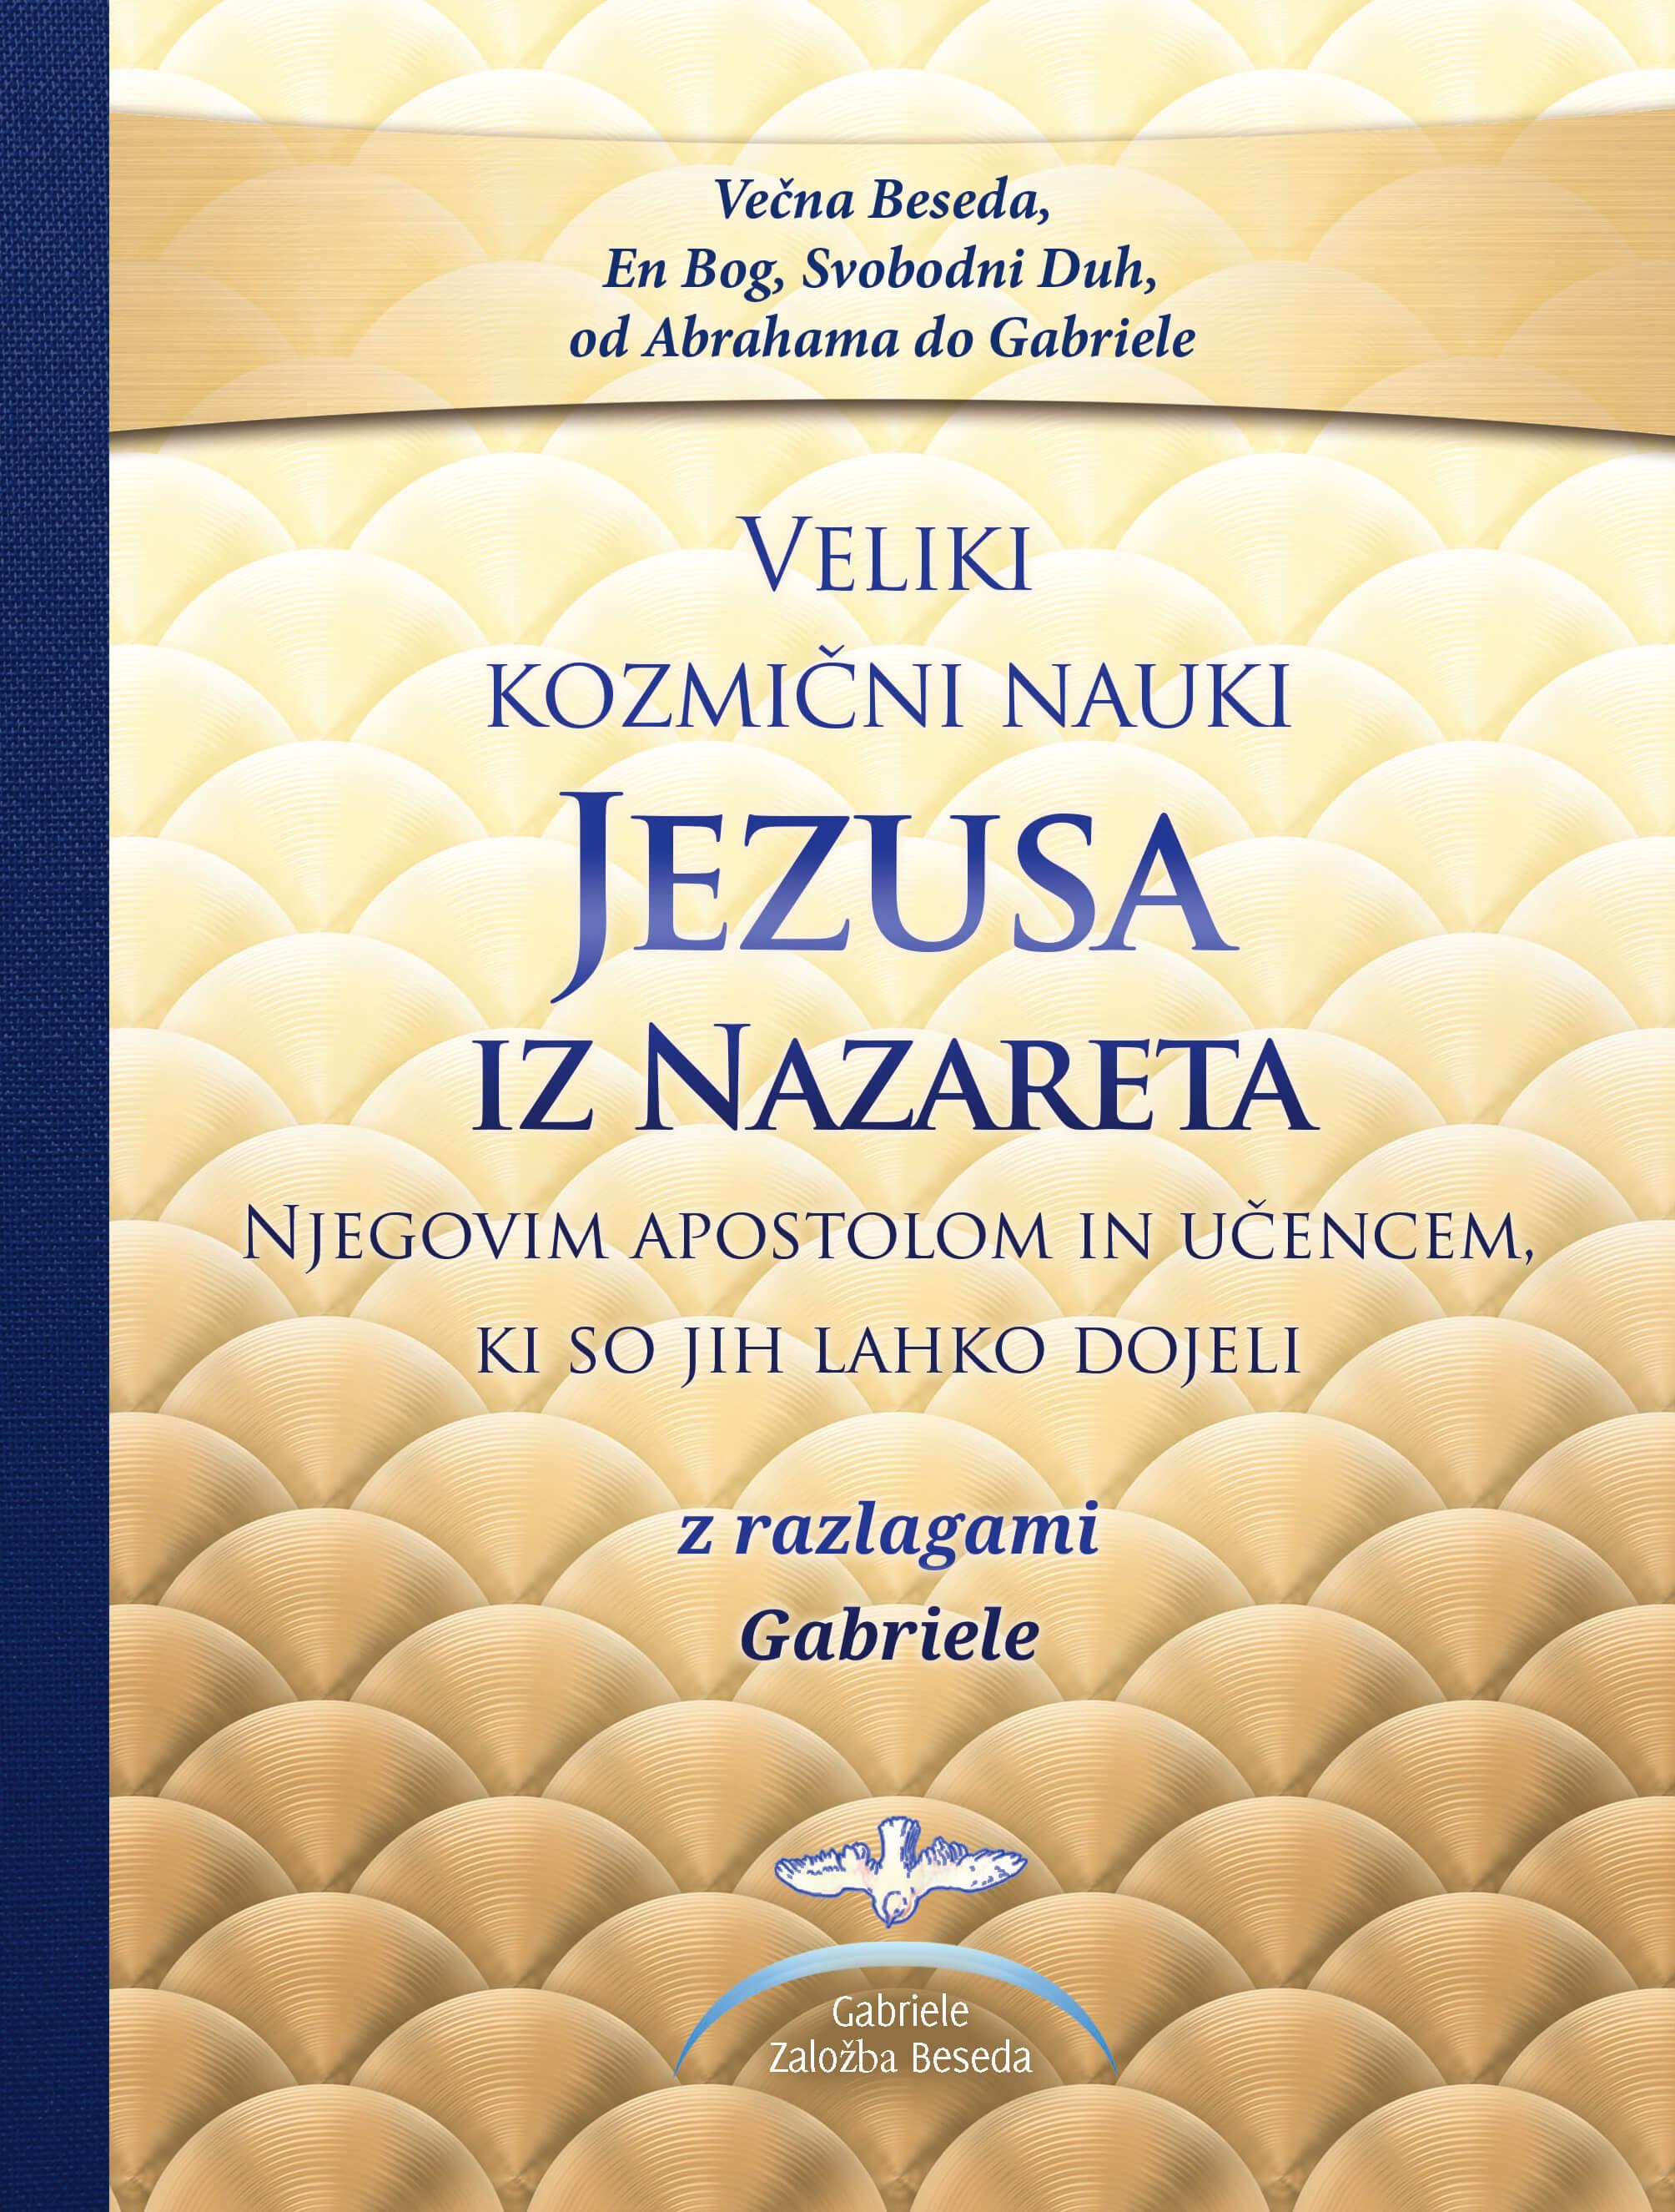 Veliki kozmični nauki<br /> Jezusa iz Nazareta<br />